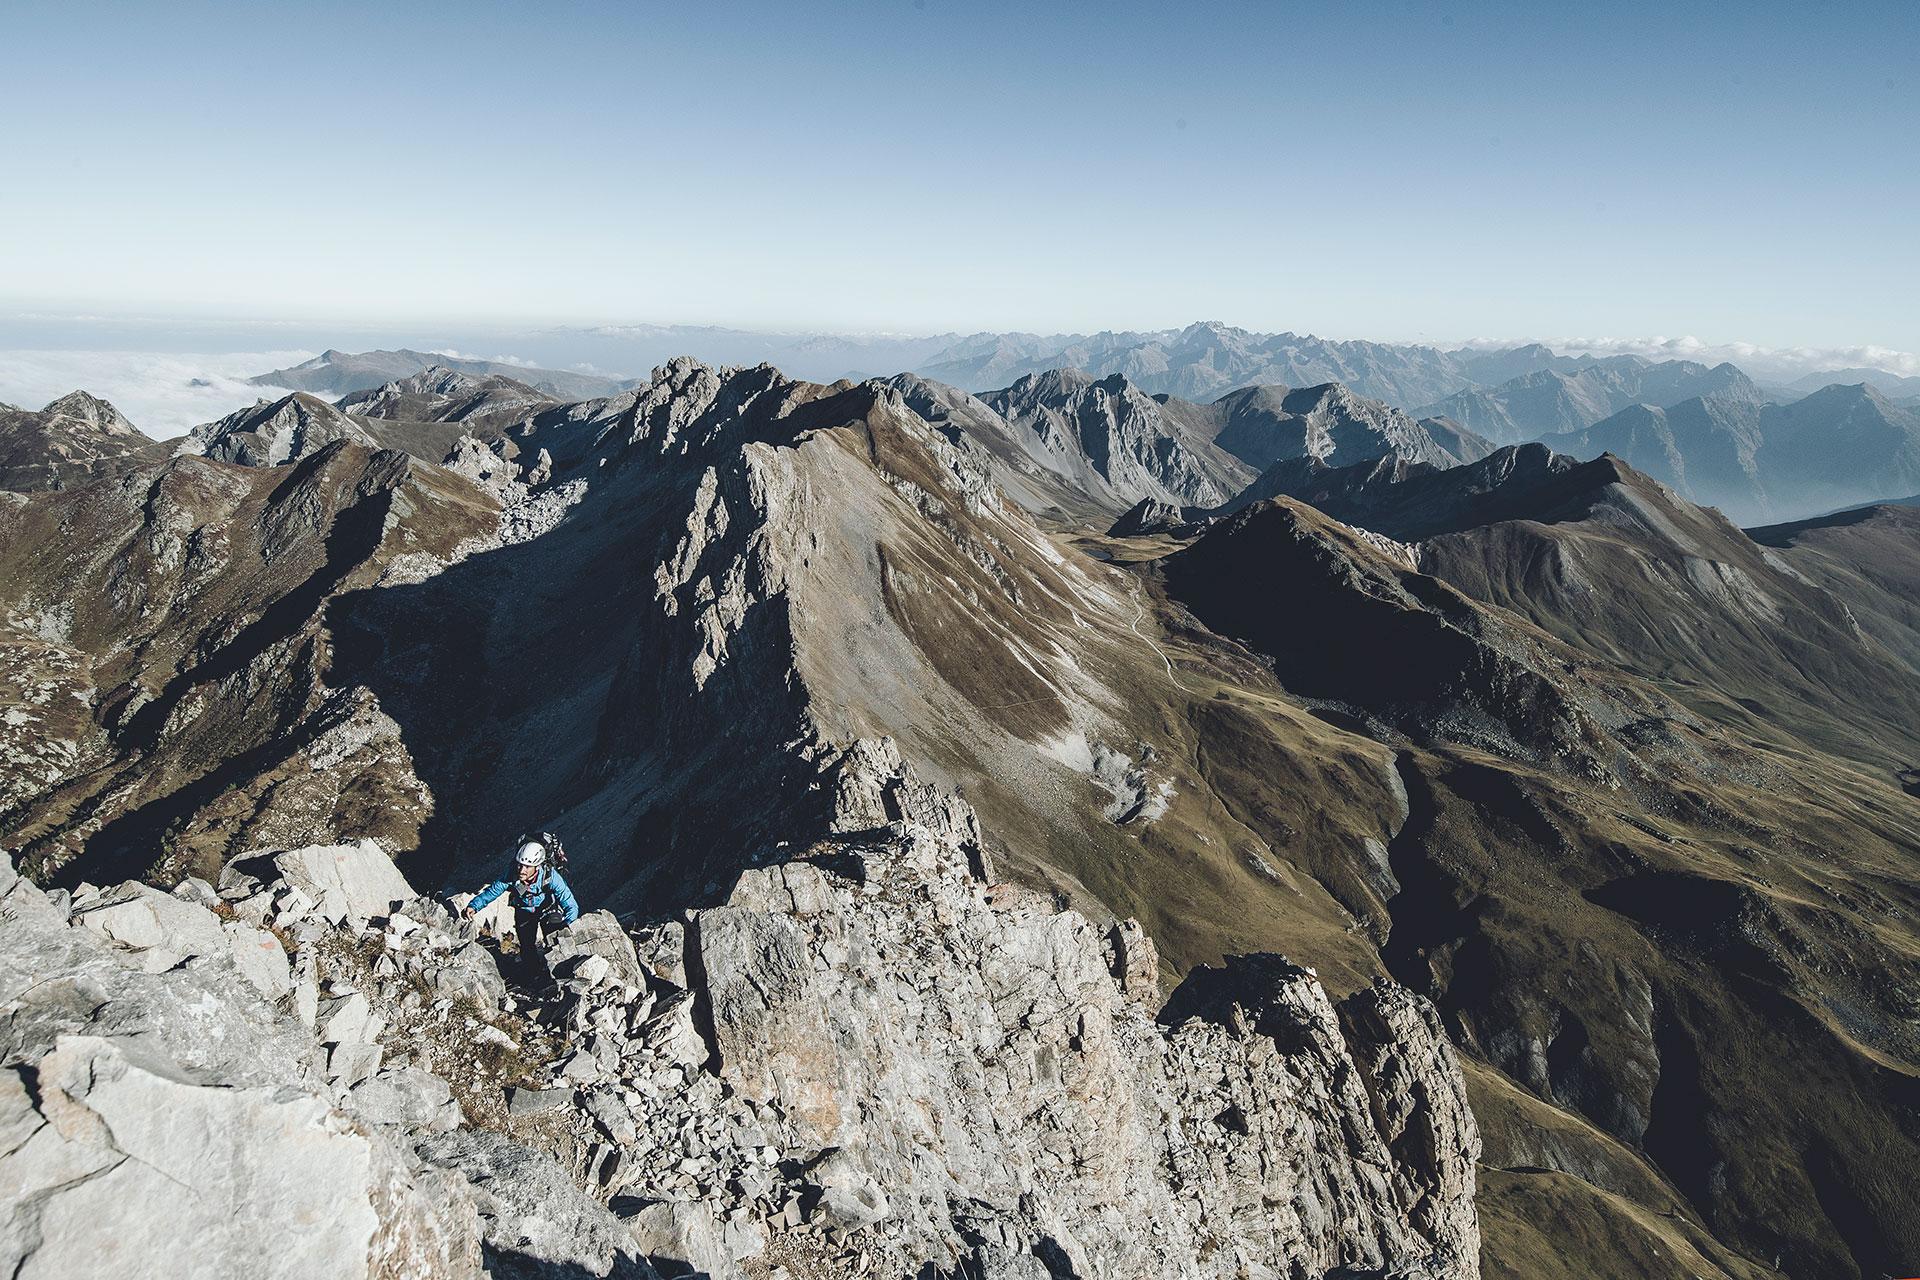 landschaft berge fotograf alpen bergsteigen trekking deutschland koeln